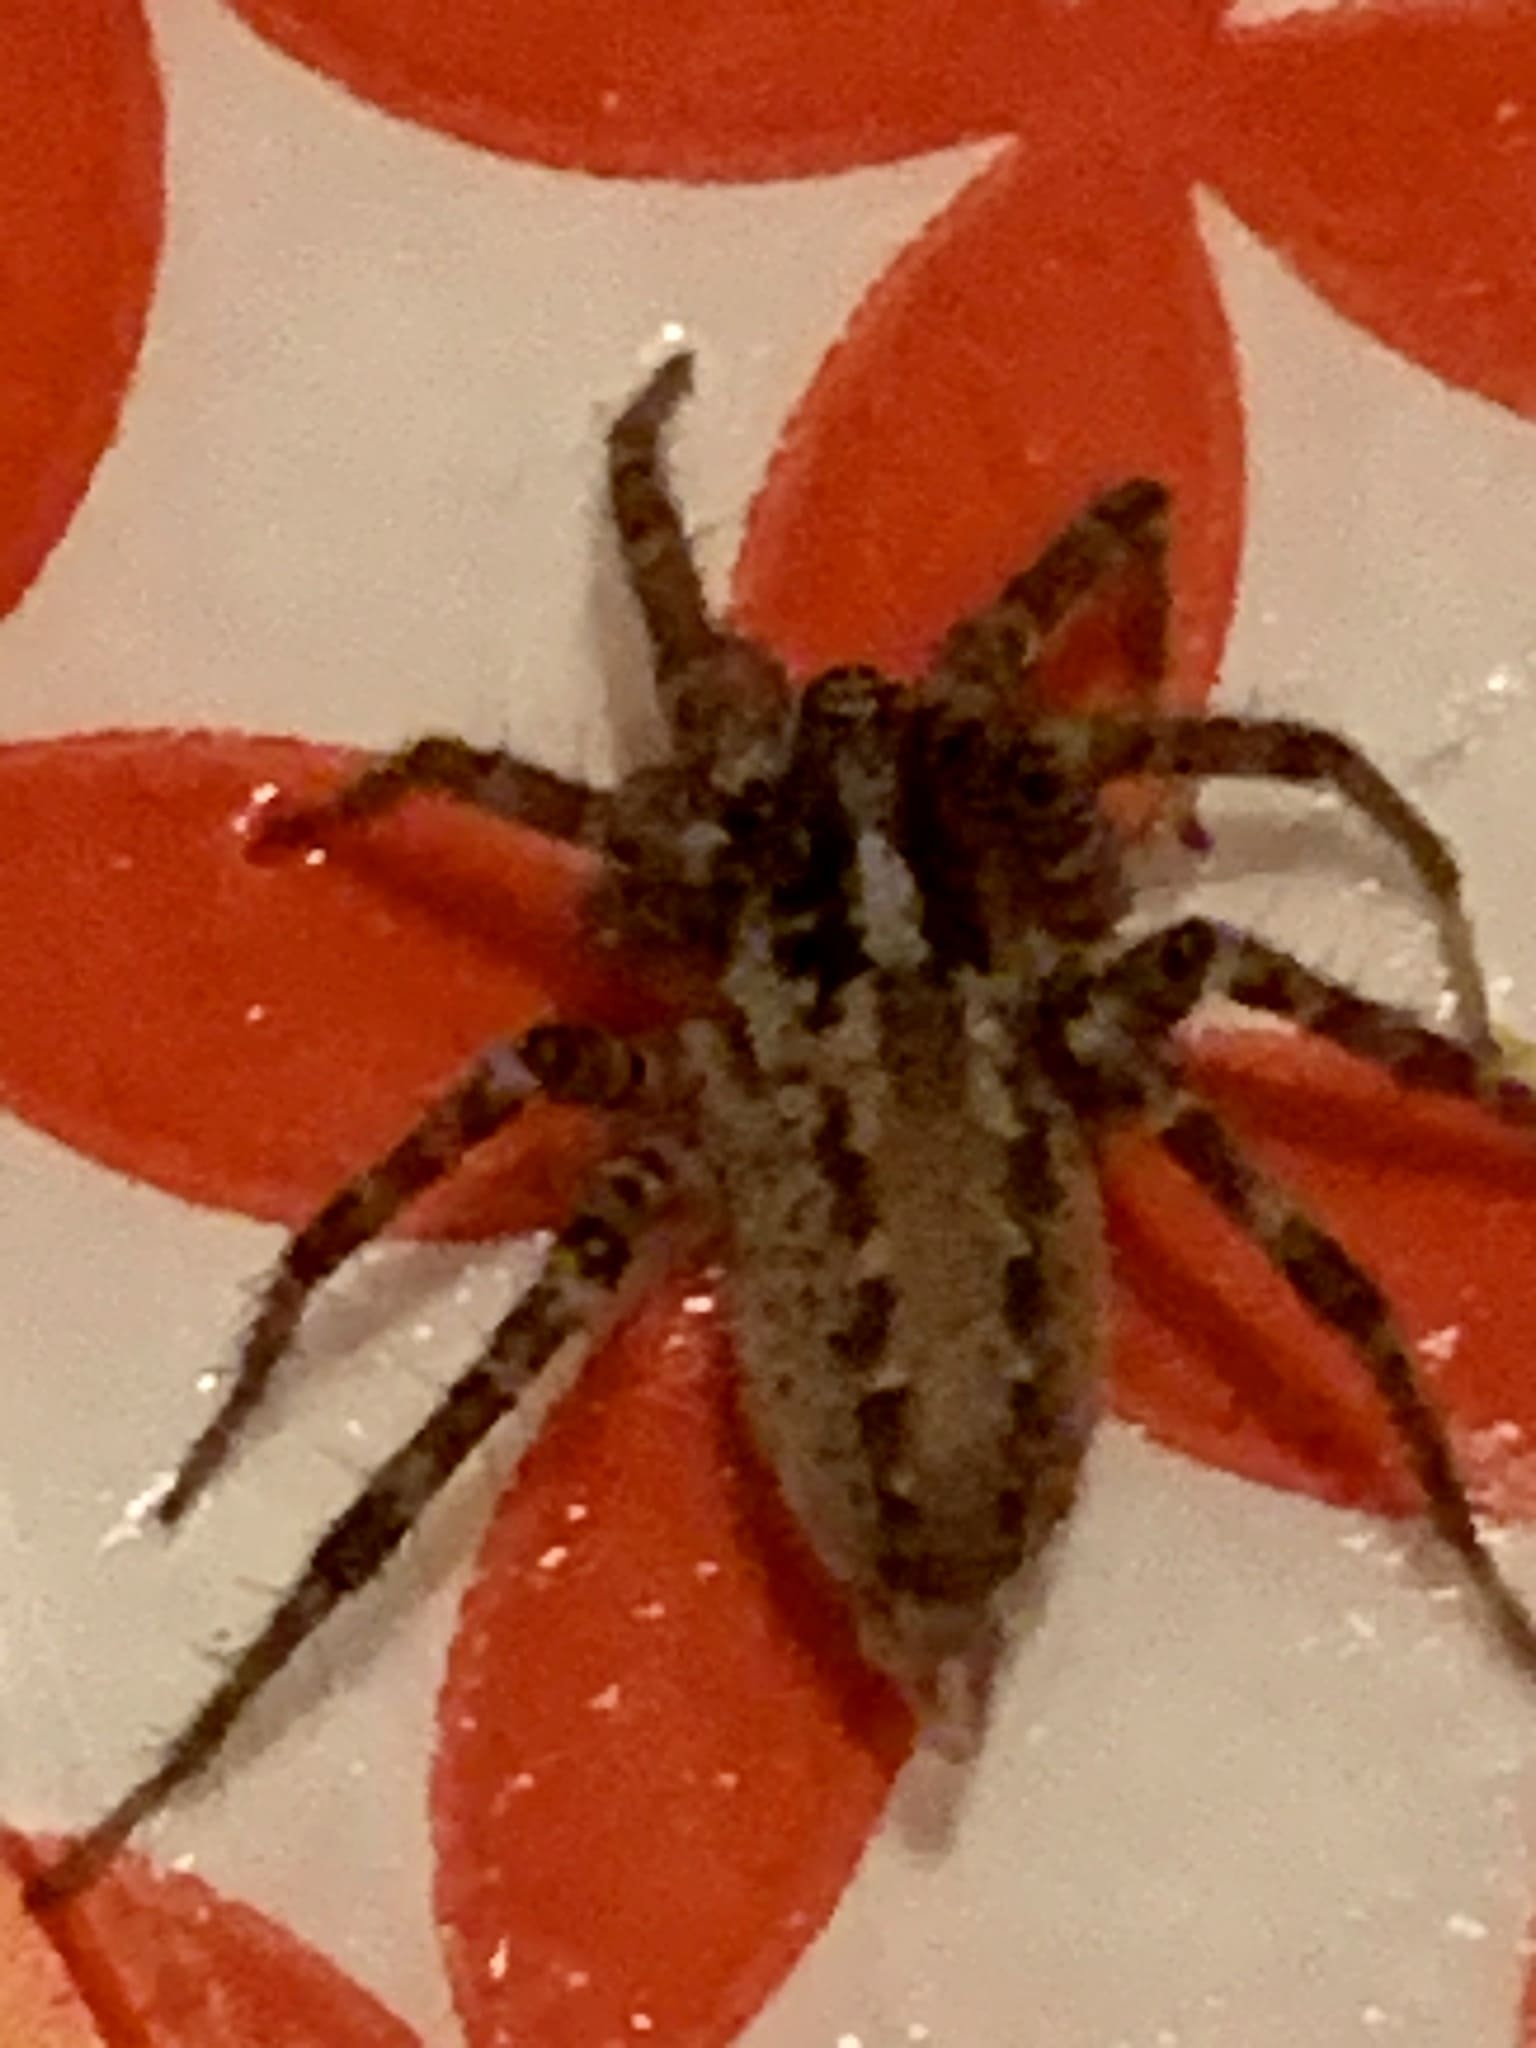 Picture of Barronopsis texana - Dorsal